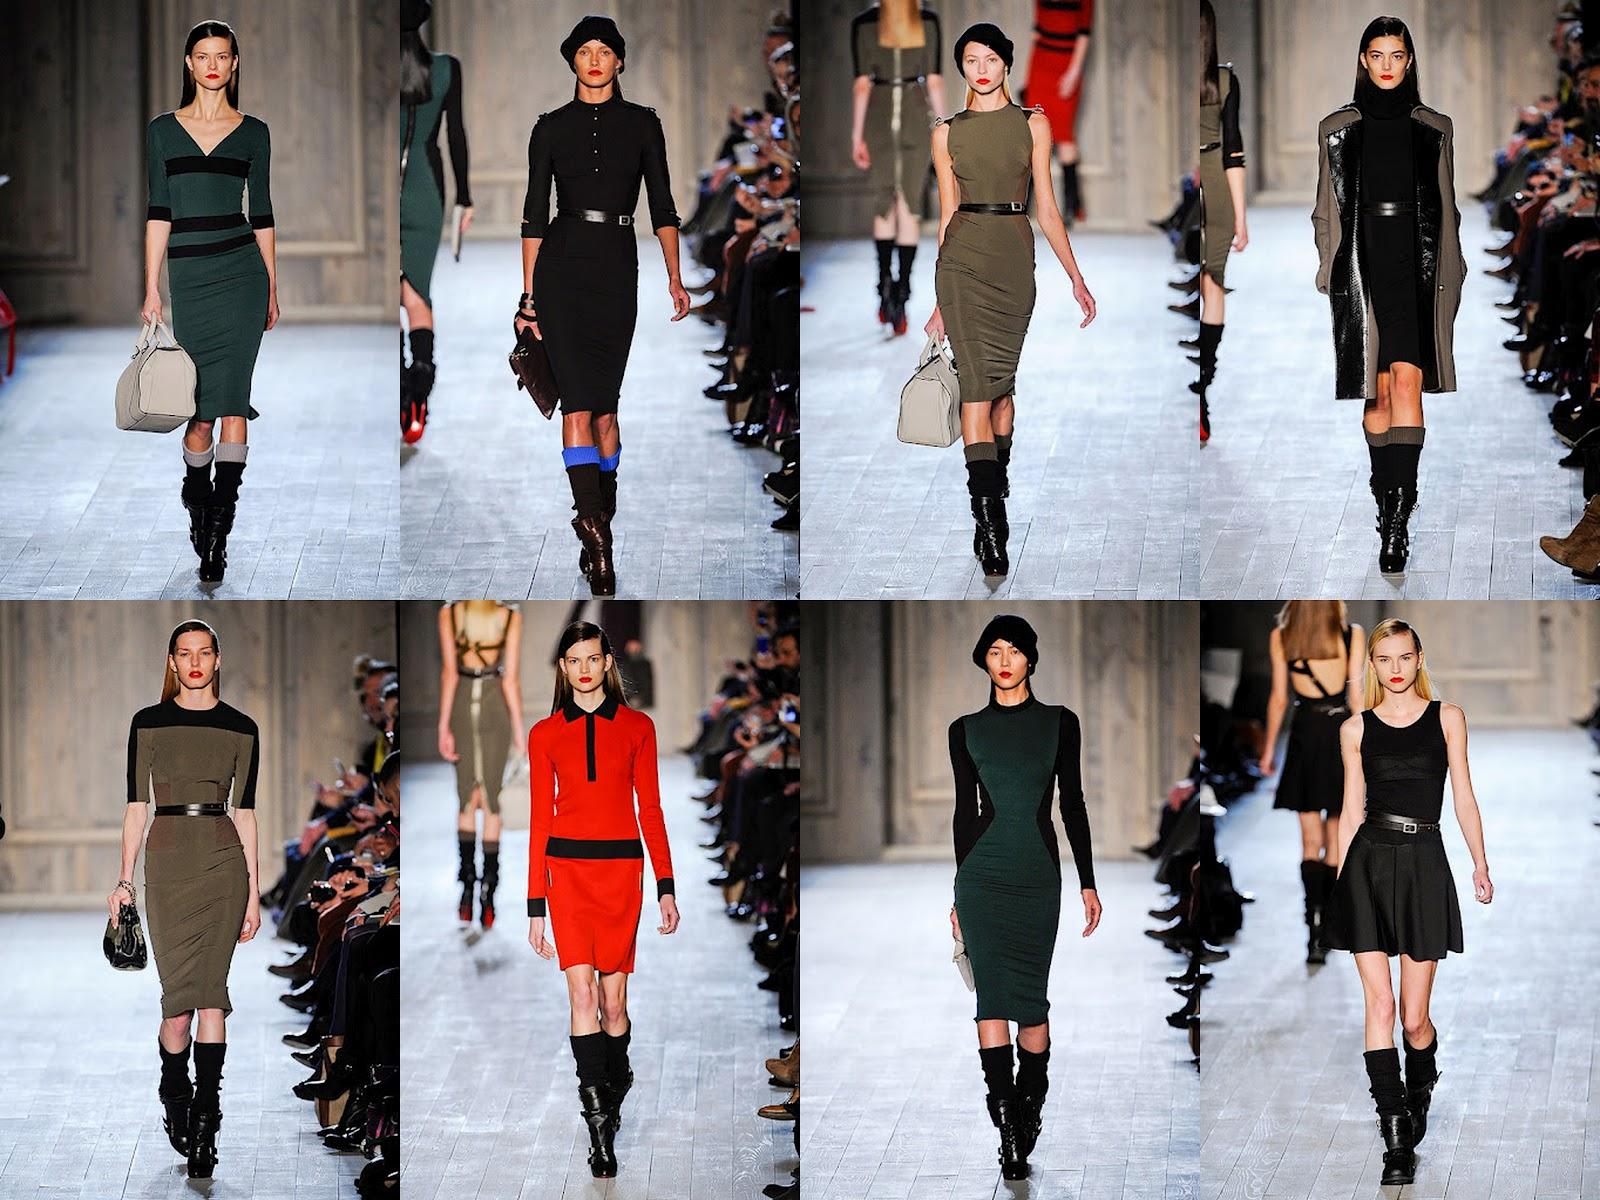 http://4.bp.blogspot.com/-hUQYDY_ttSg/Tz3dzNW7d7I/AAAAAAAAFyU/OQsTKOO_X-M/s1600/victoria_beckham_fall_2012_rtw_nyc_fashion_week.jpg